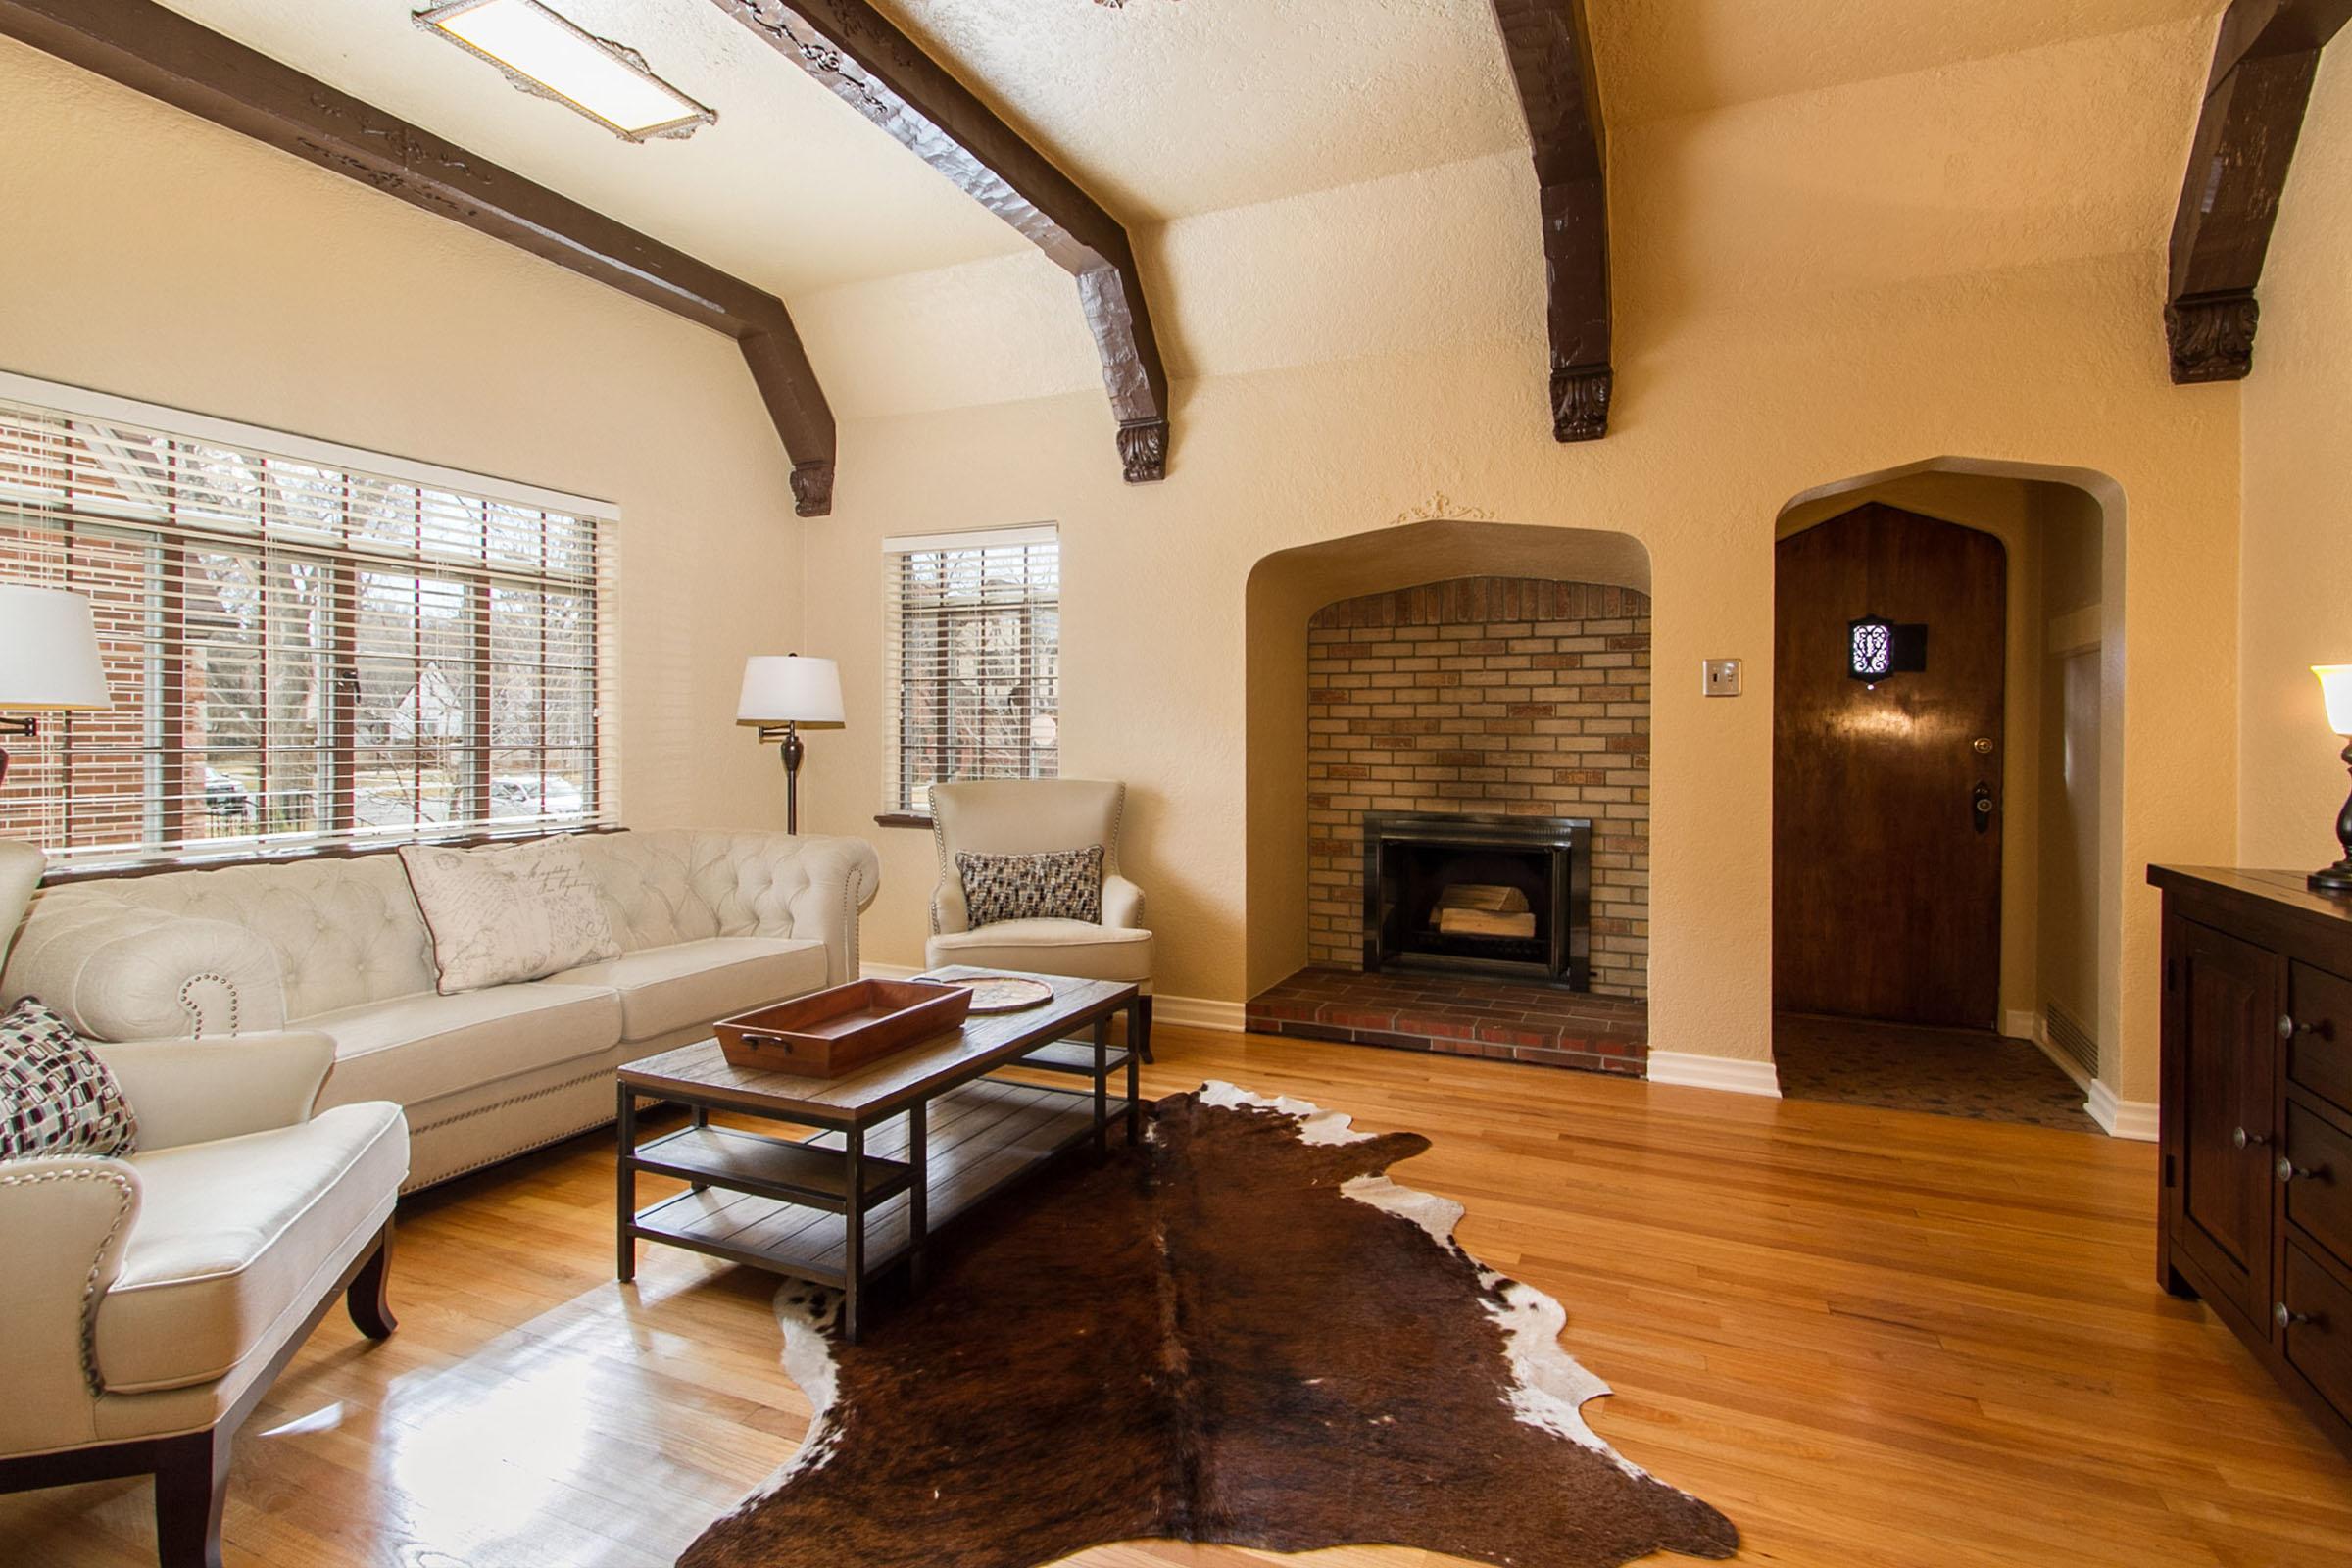 1177290_Vaulted-Living-Room-with-Fireplace-Inglenook_high.jpg